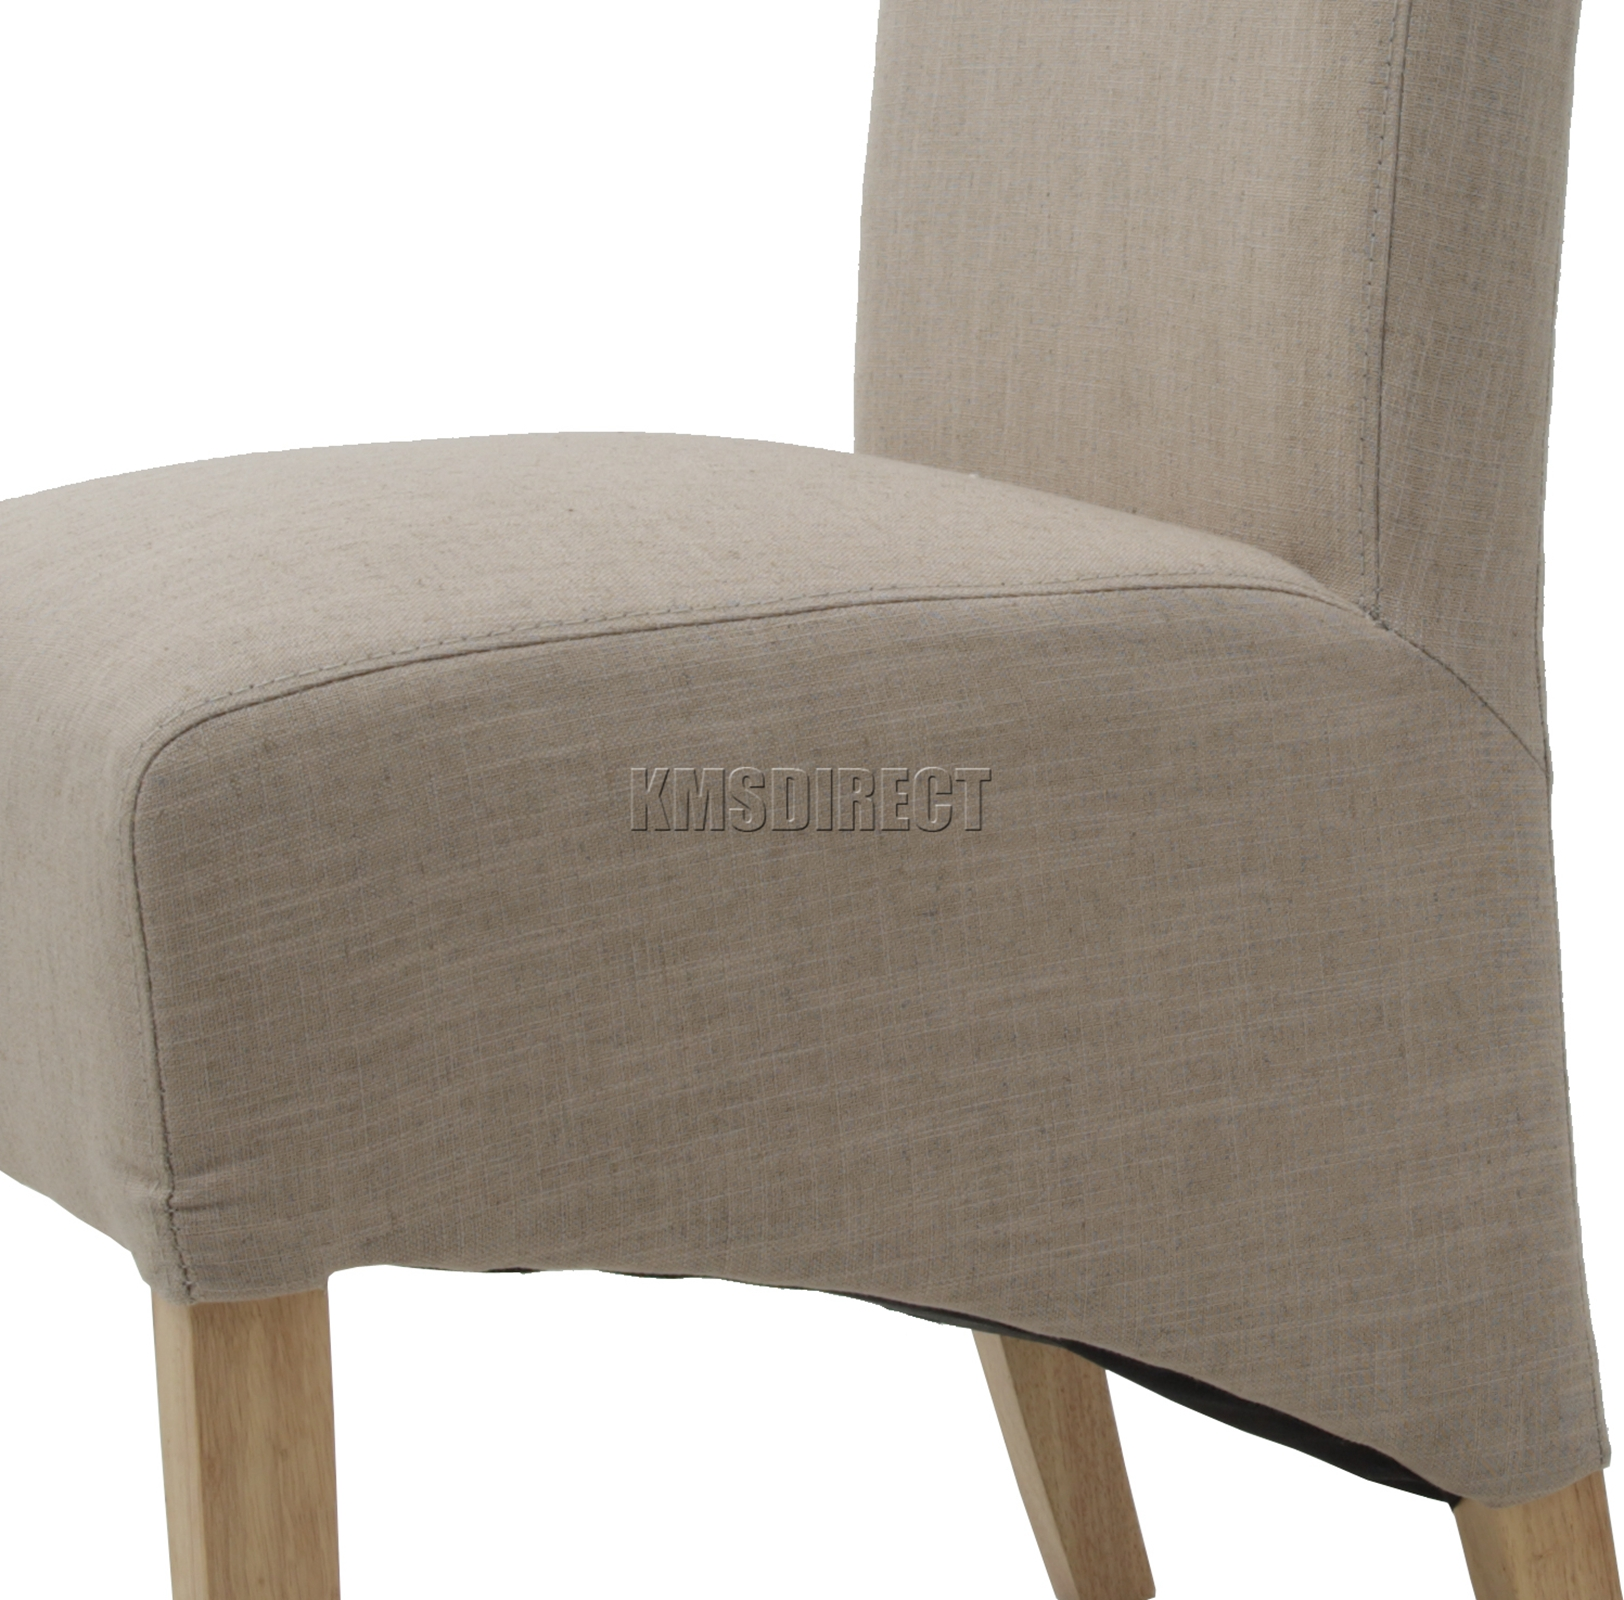 FoxHunter Cream Linen Fabric Dining Chairs Scroll High  : DINING CHAIR FABRIC DCF01 CREAM KMSWM006 from www.ebay.ie size 1624 x 1600 jpeg 1232kB